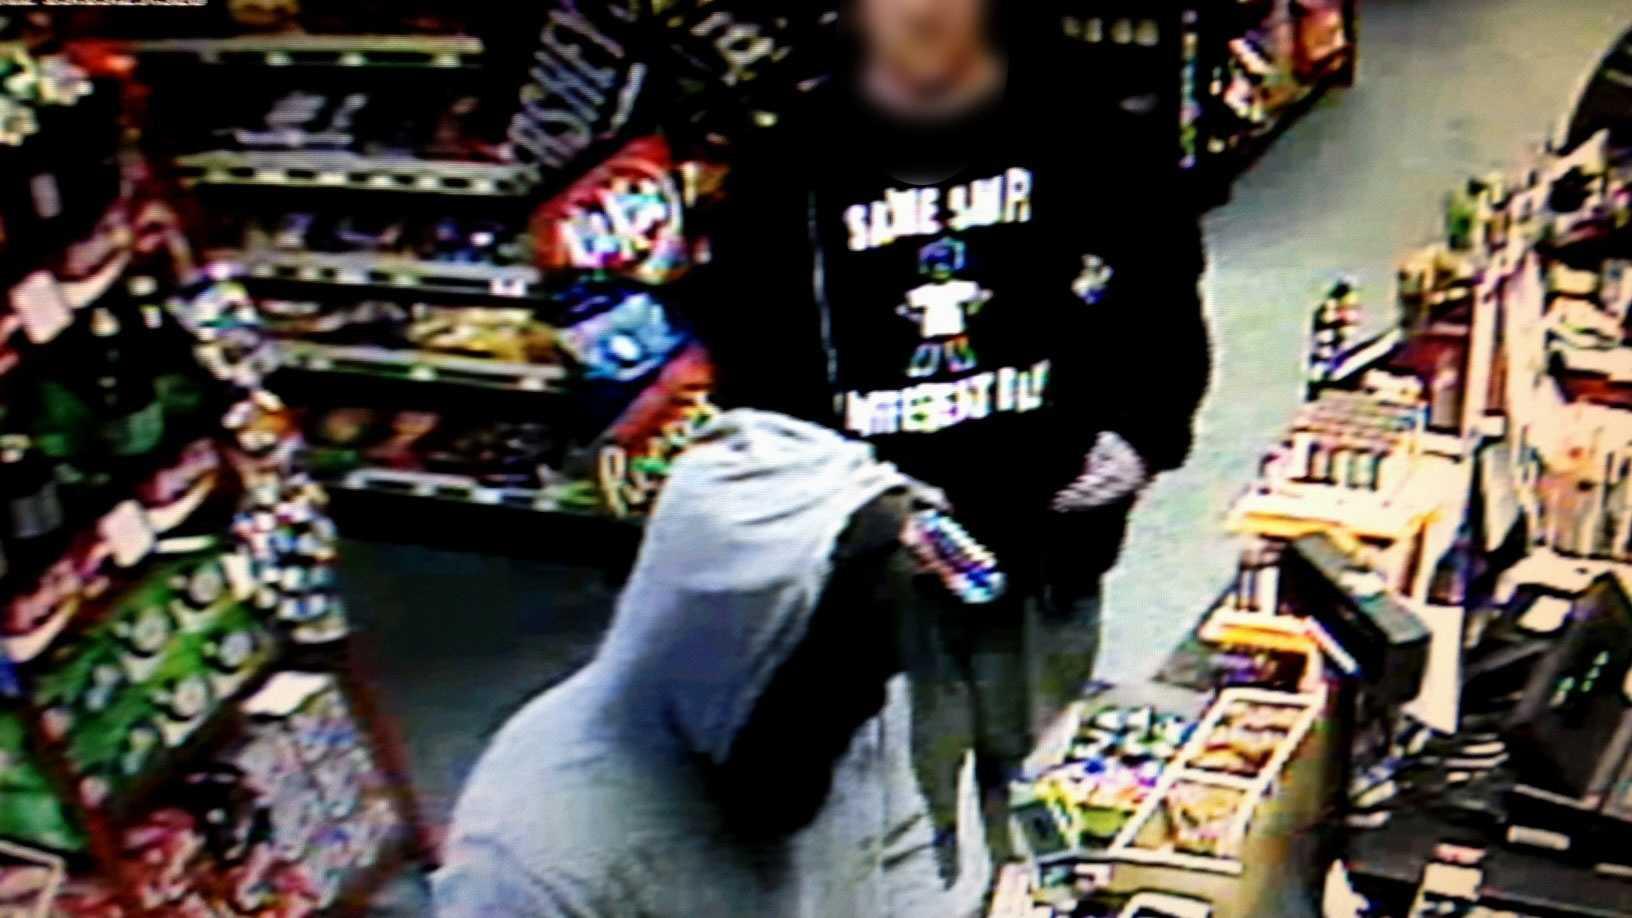 Tilton robbery suspect